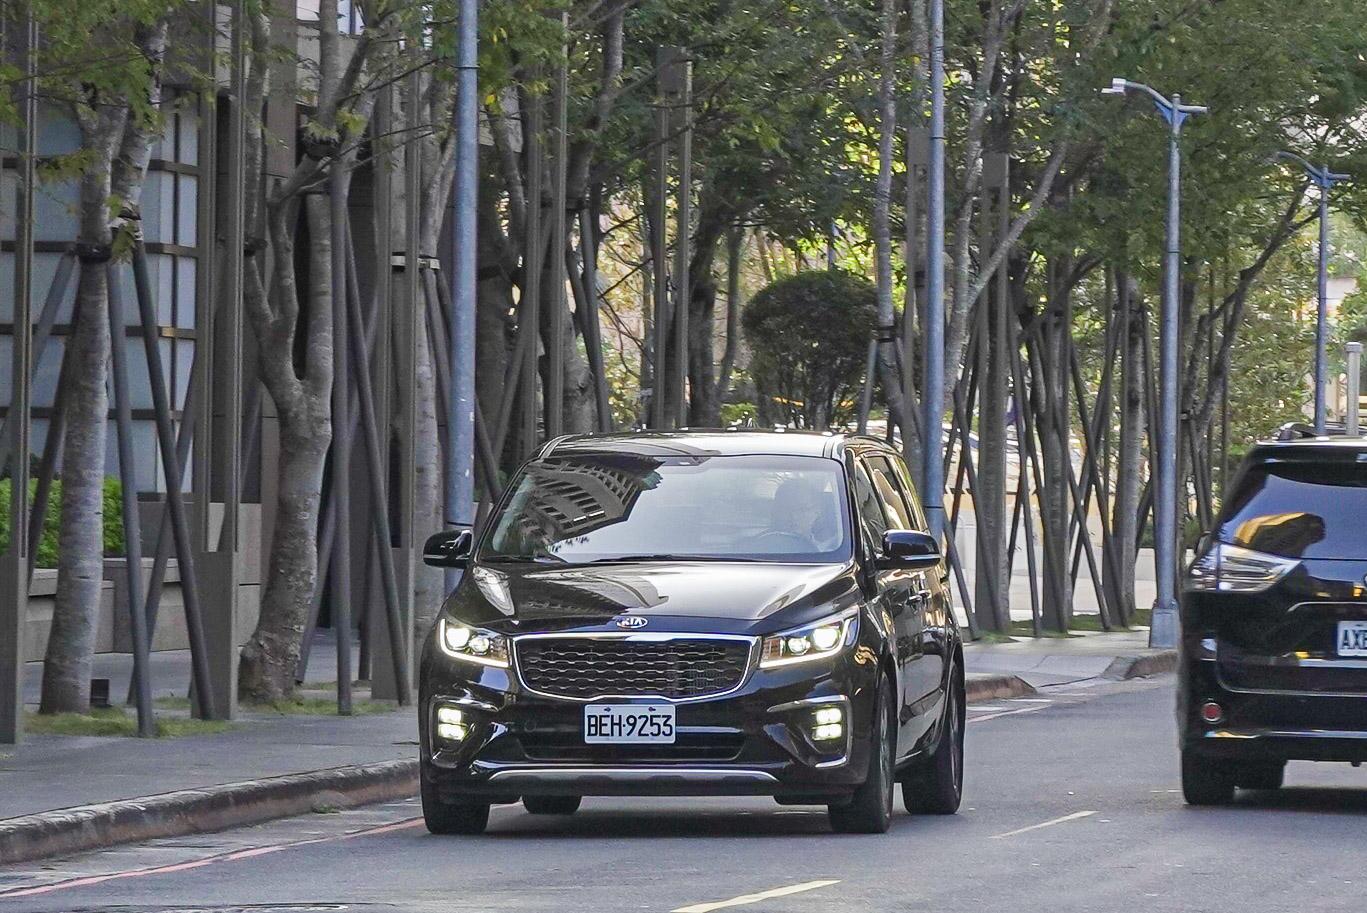 Toyota Sienna 以外,全尺碼家用 MPV 車型又多了 Kia Grand Carnival 可供選擇。